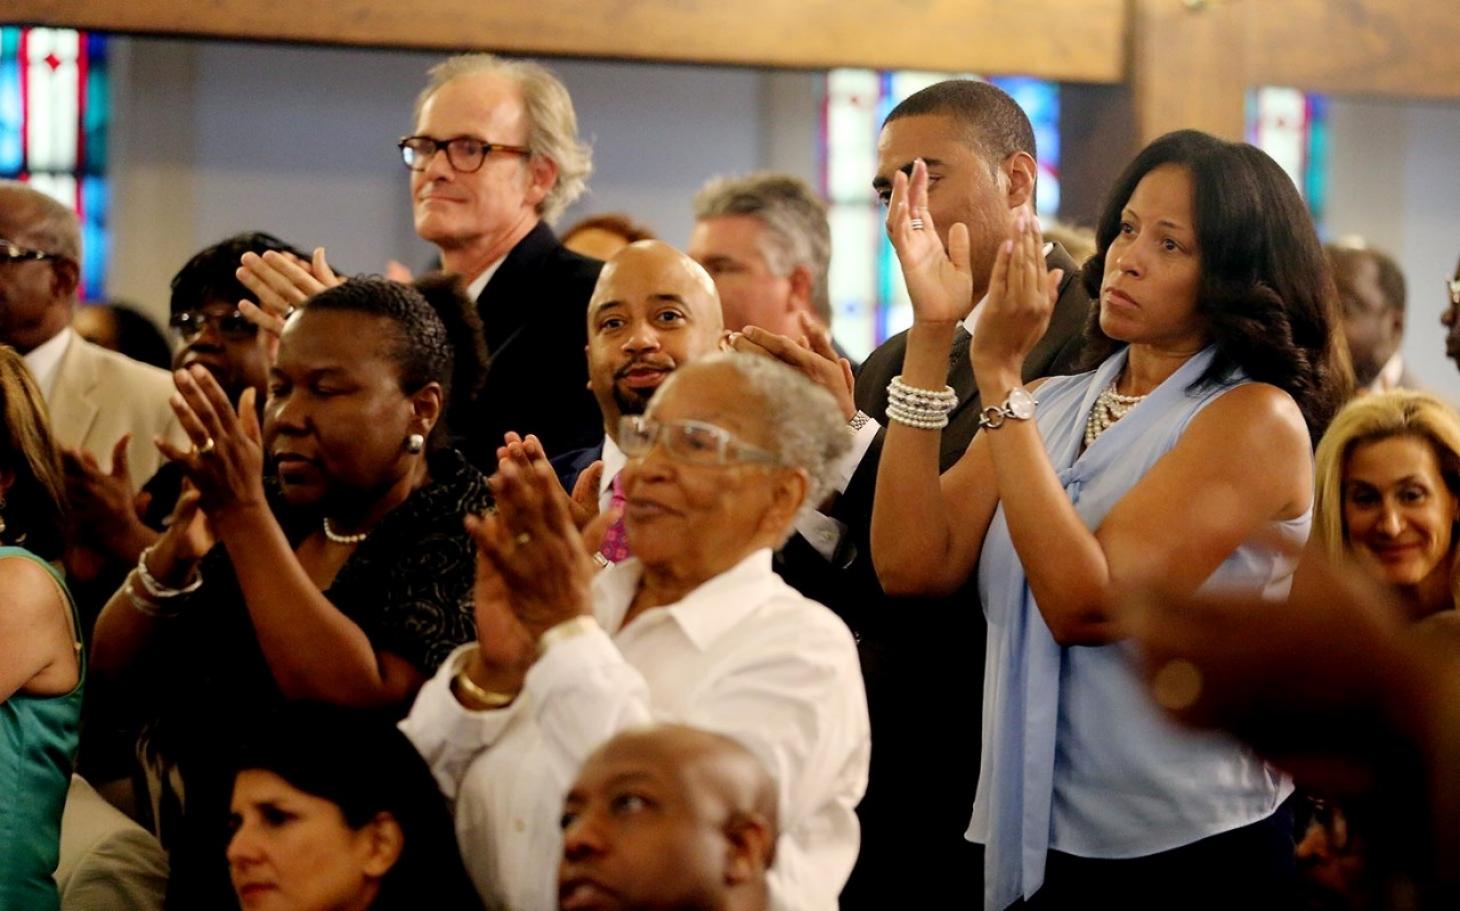 Black people in church